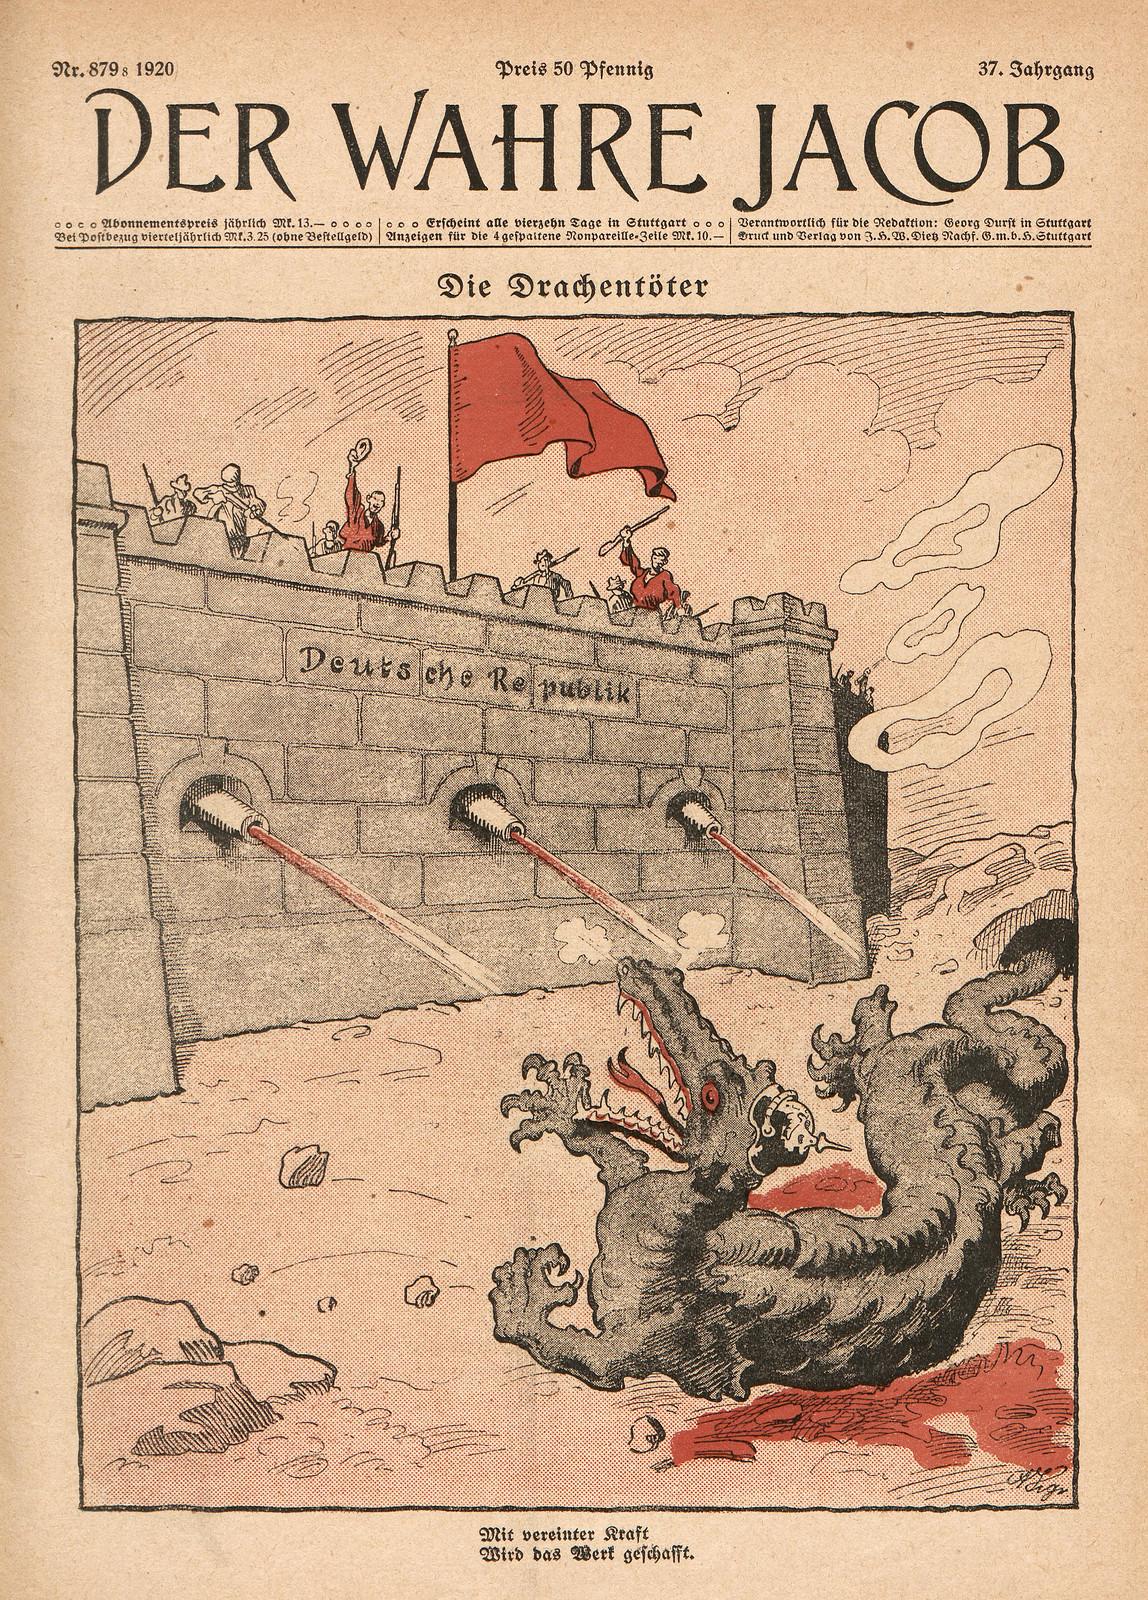 Arthur Krüger - Die Drachentöter, 1920